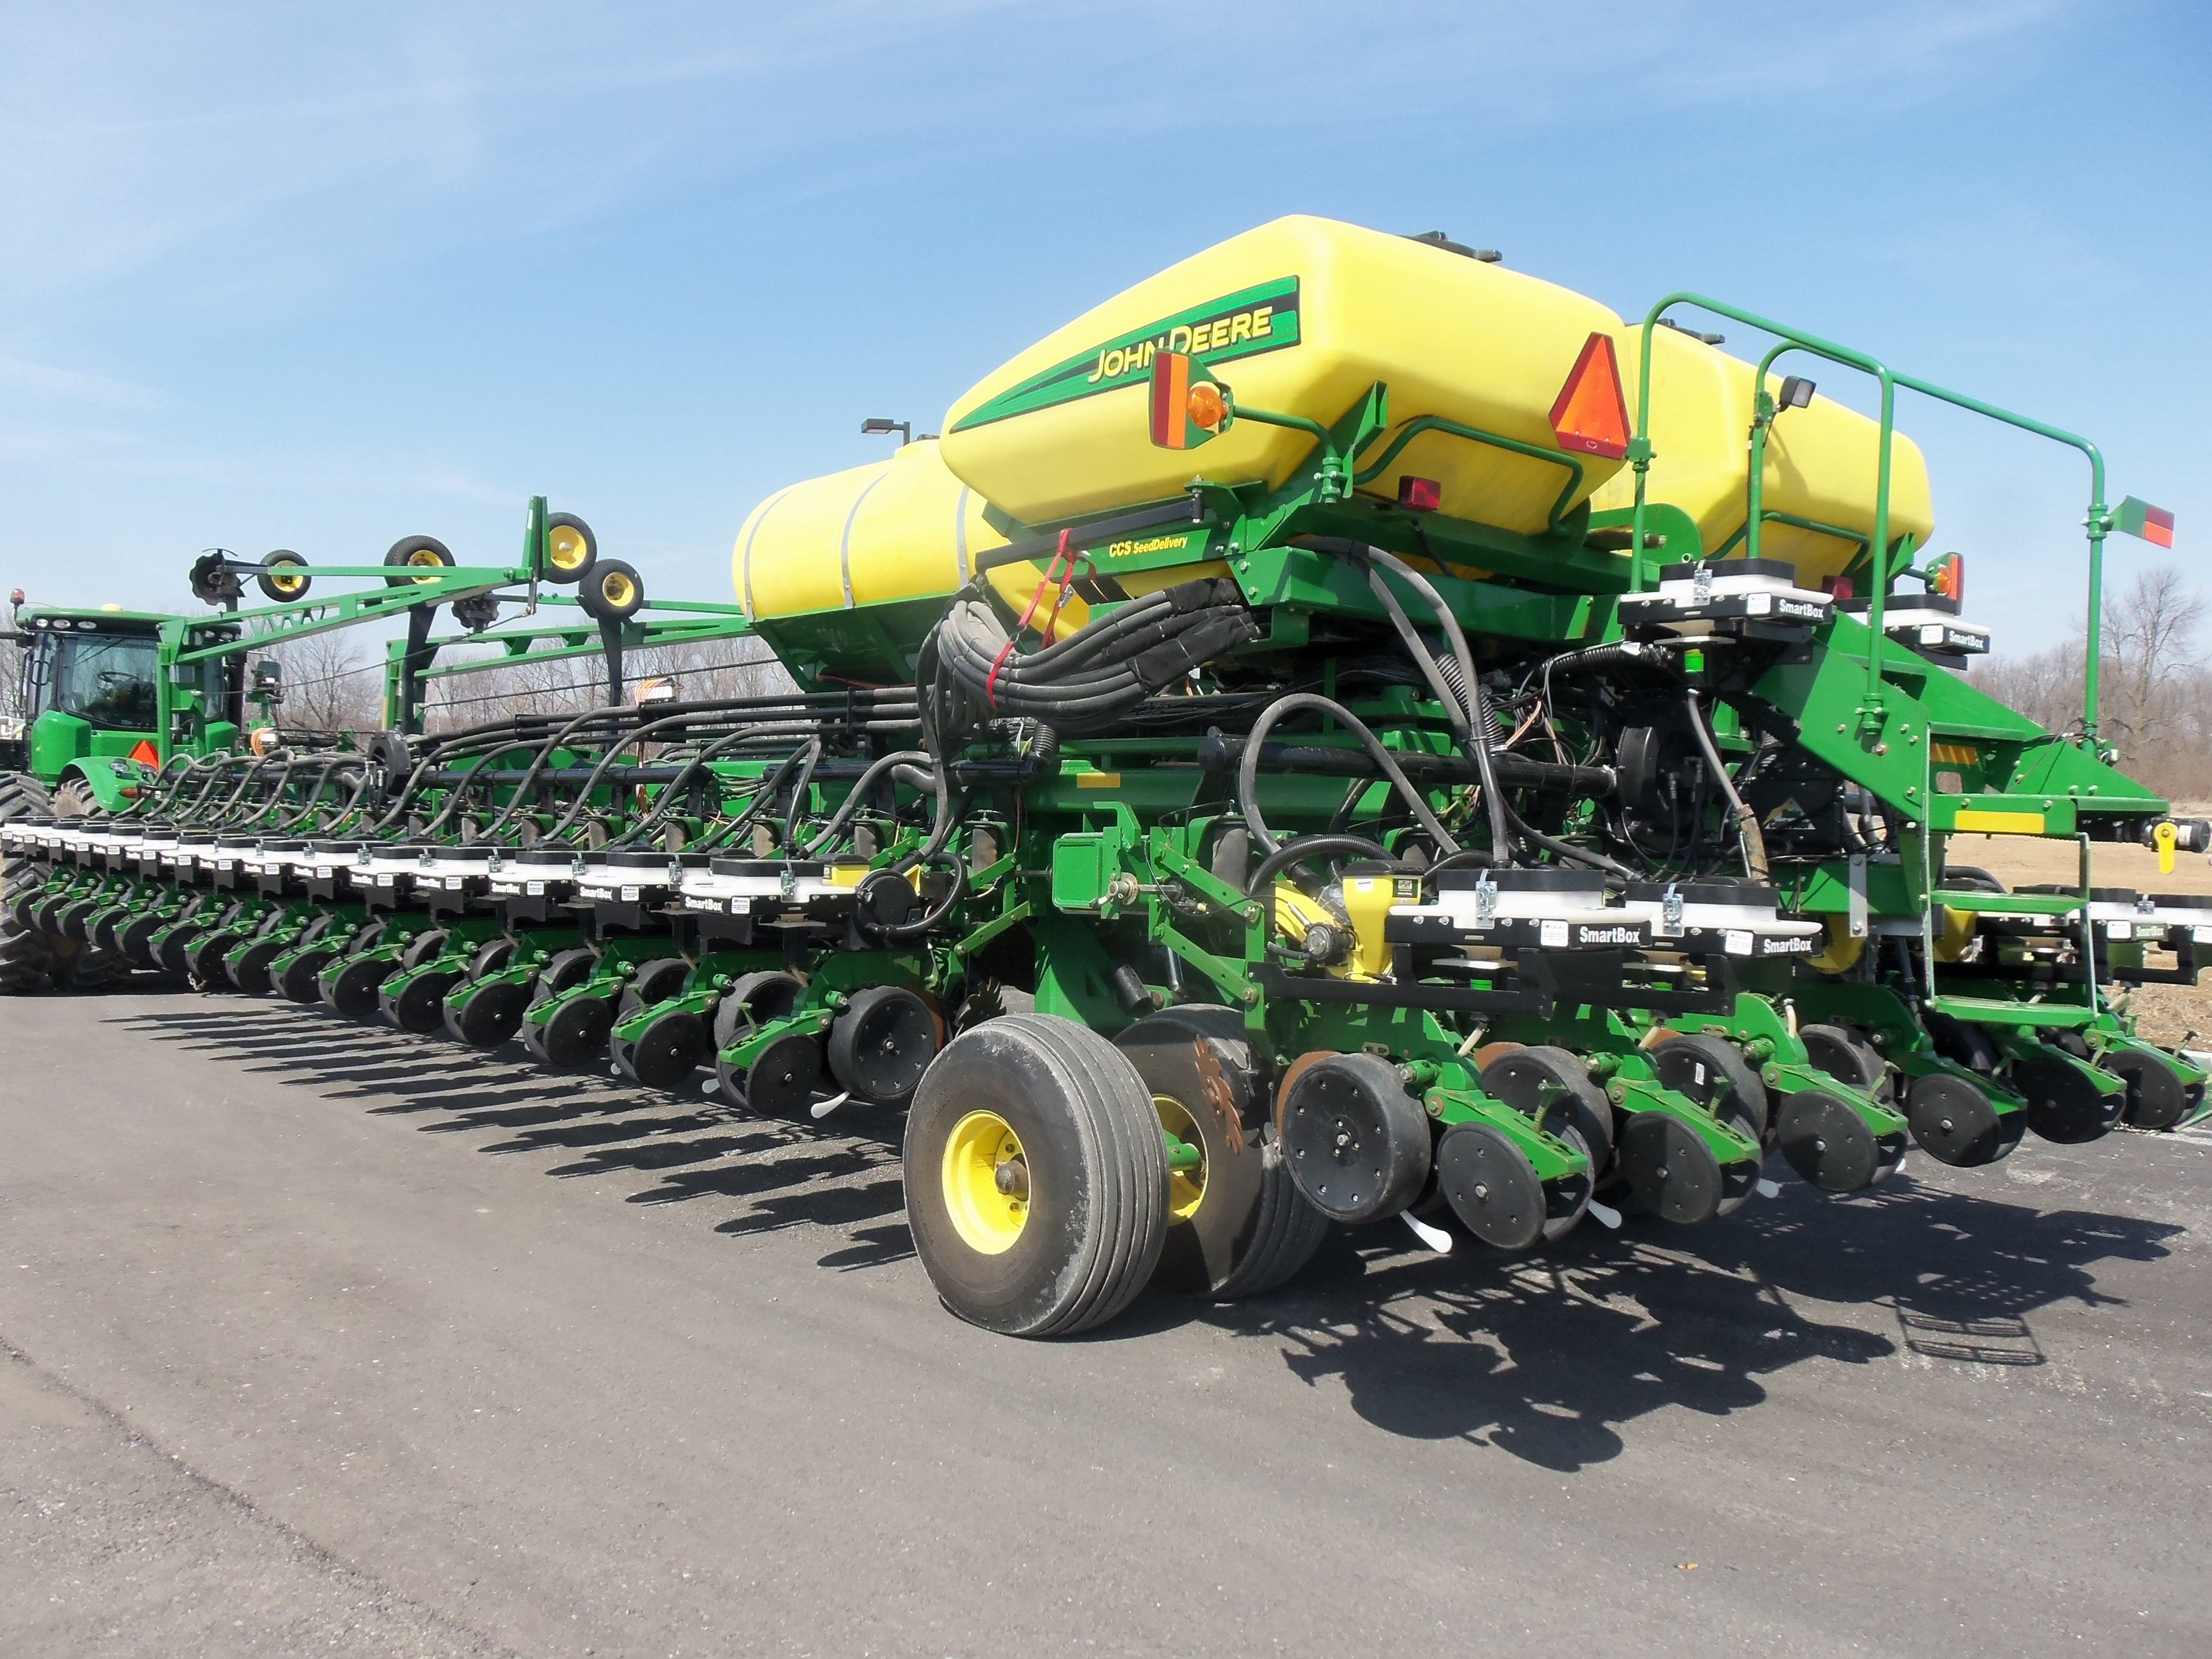 36 Row John Deere Db90 Corn Planter John Deere Equipment John